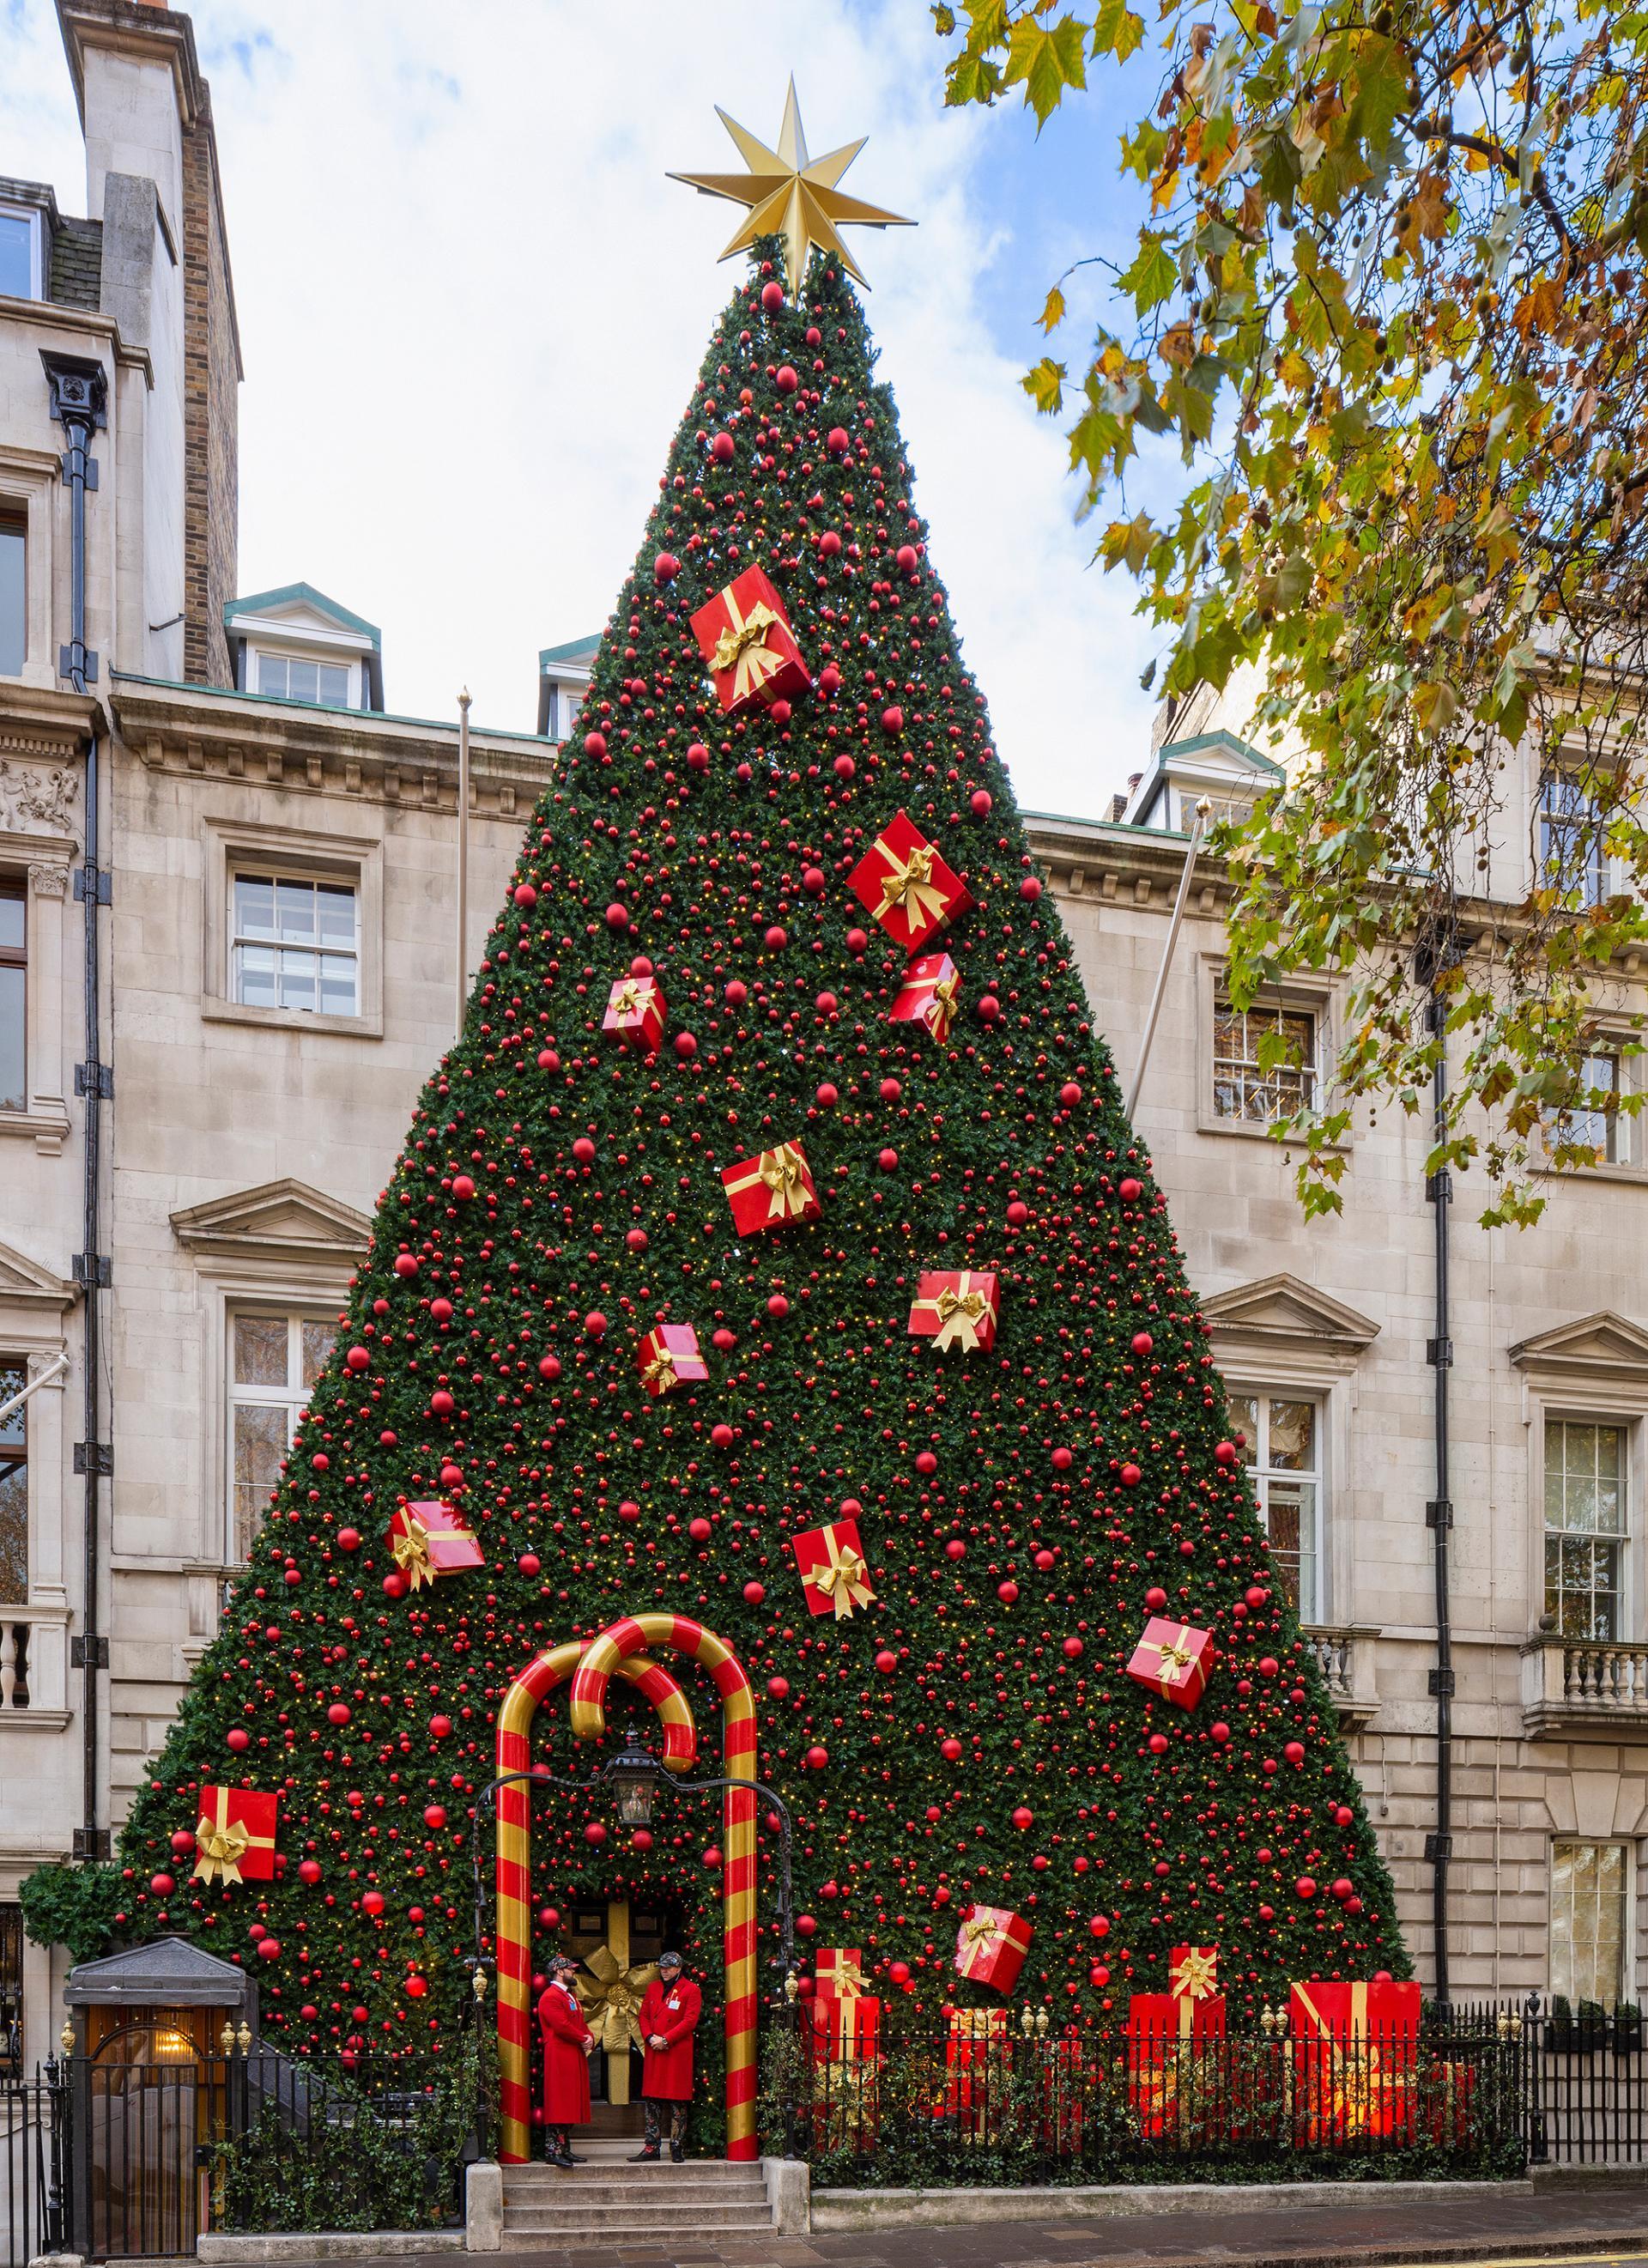 annabels-christmas-tree-london1.jpg